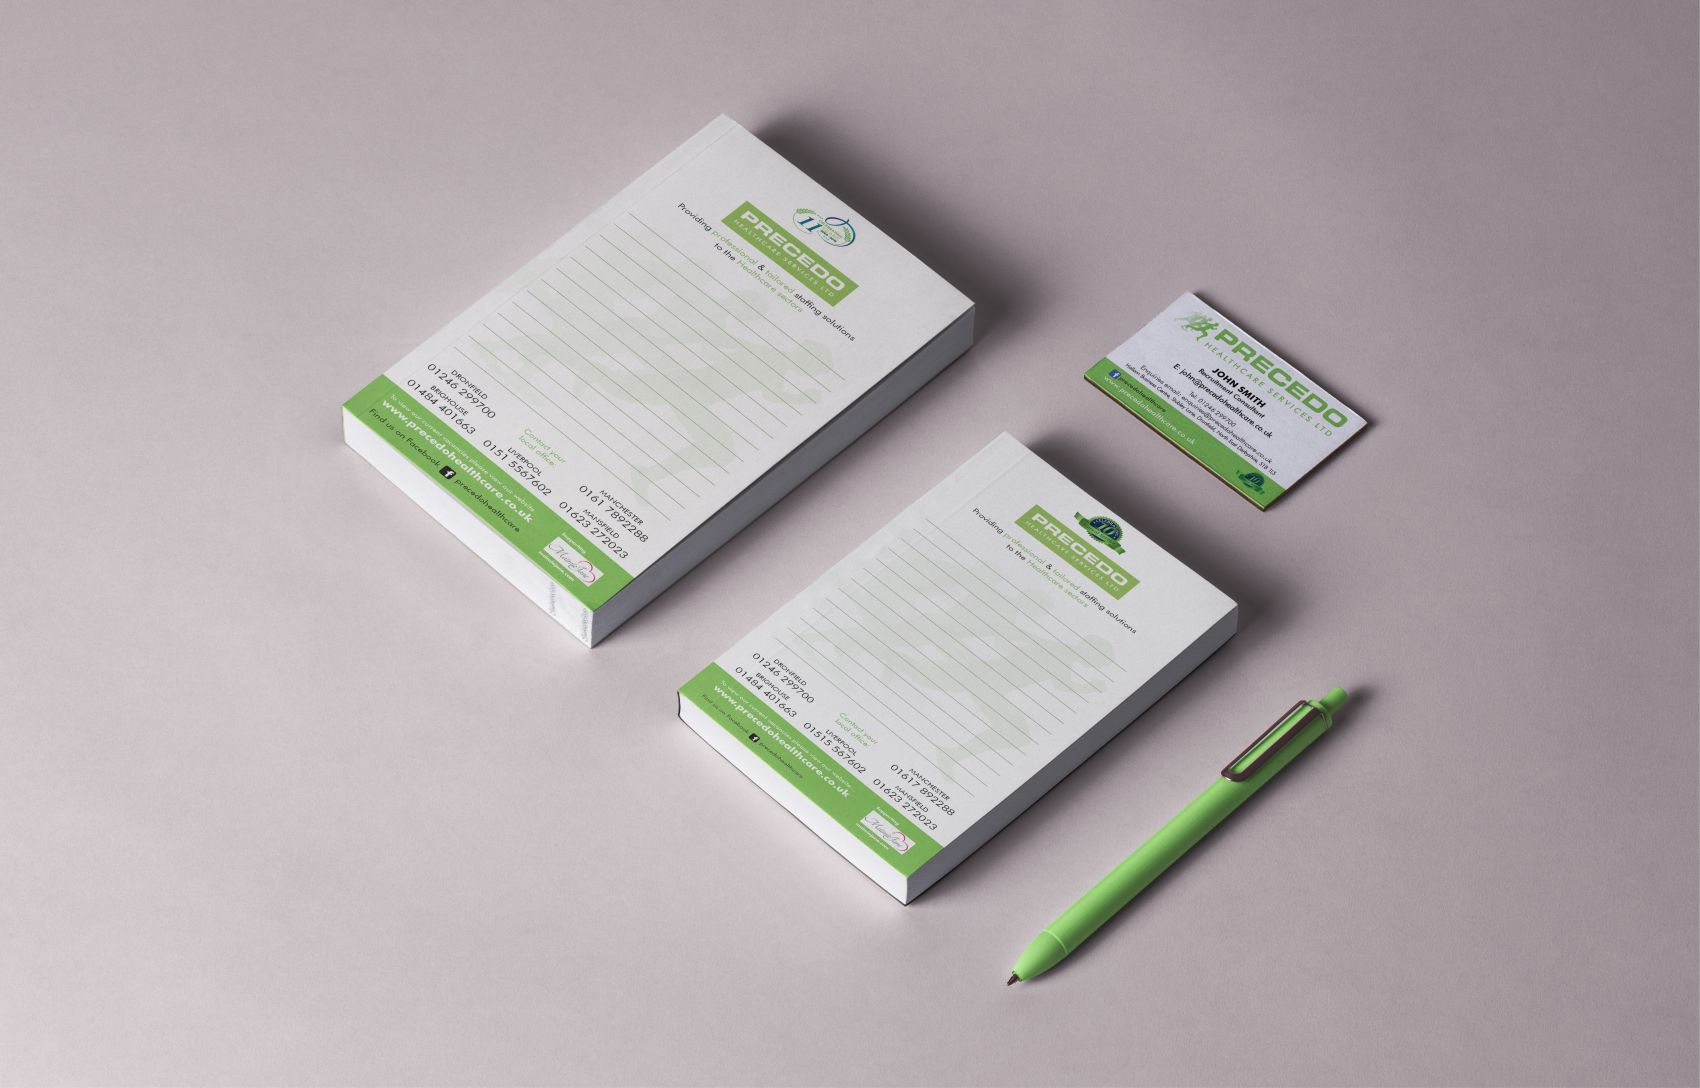 Notepads-Deskpads-Design-Mockup-Precedo